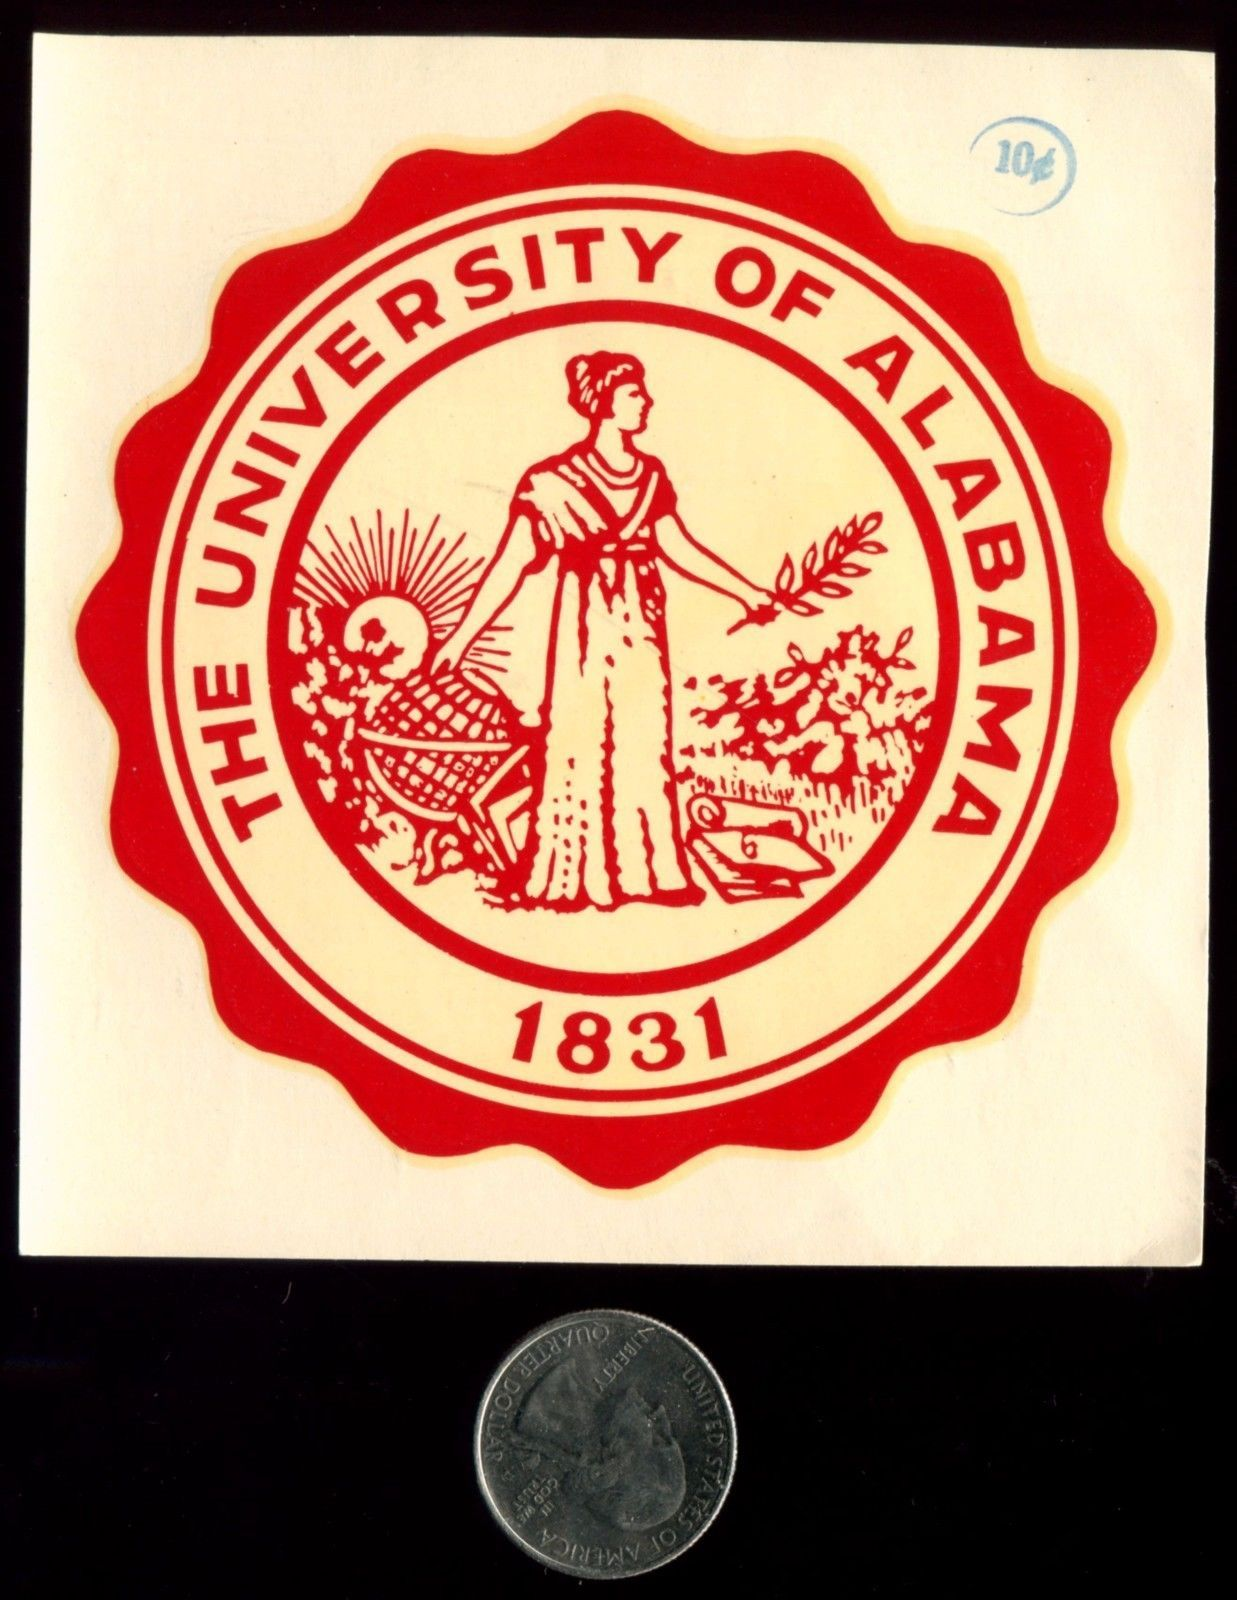 University Of Alabama Seal Vintage Souvenir Decal   joey\'s world ...